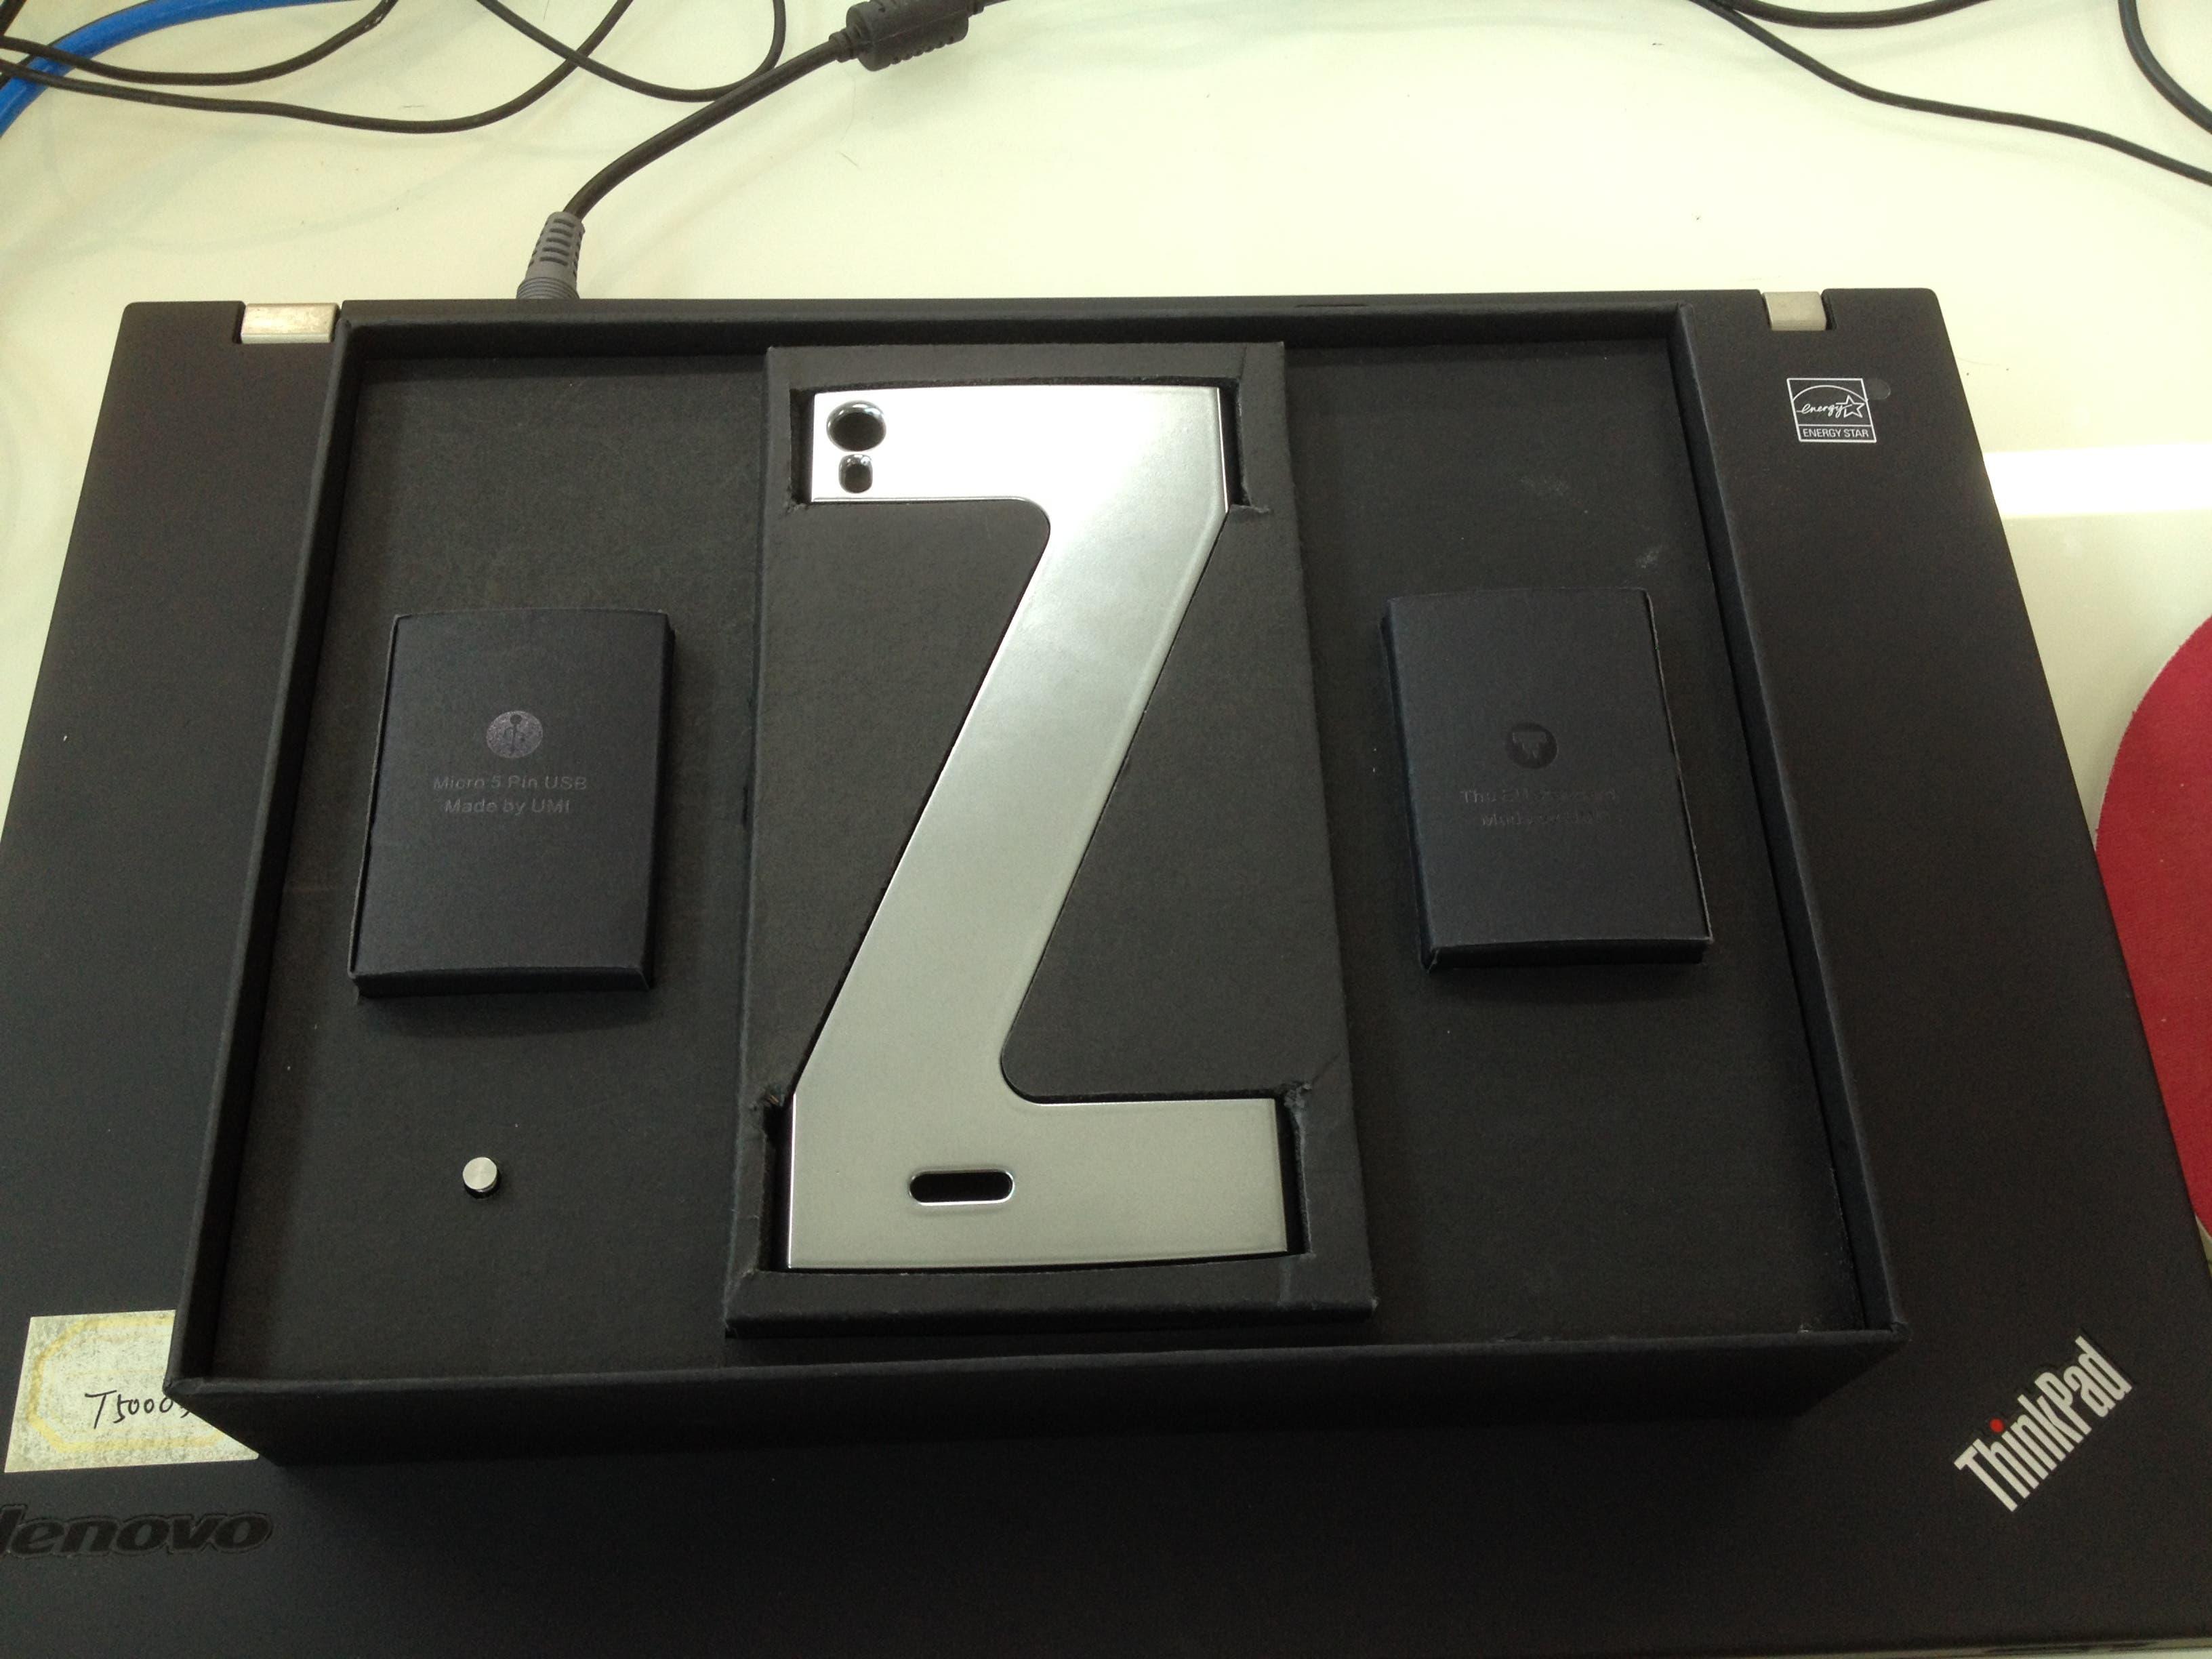 umi zero unboxing